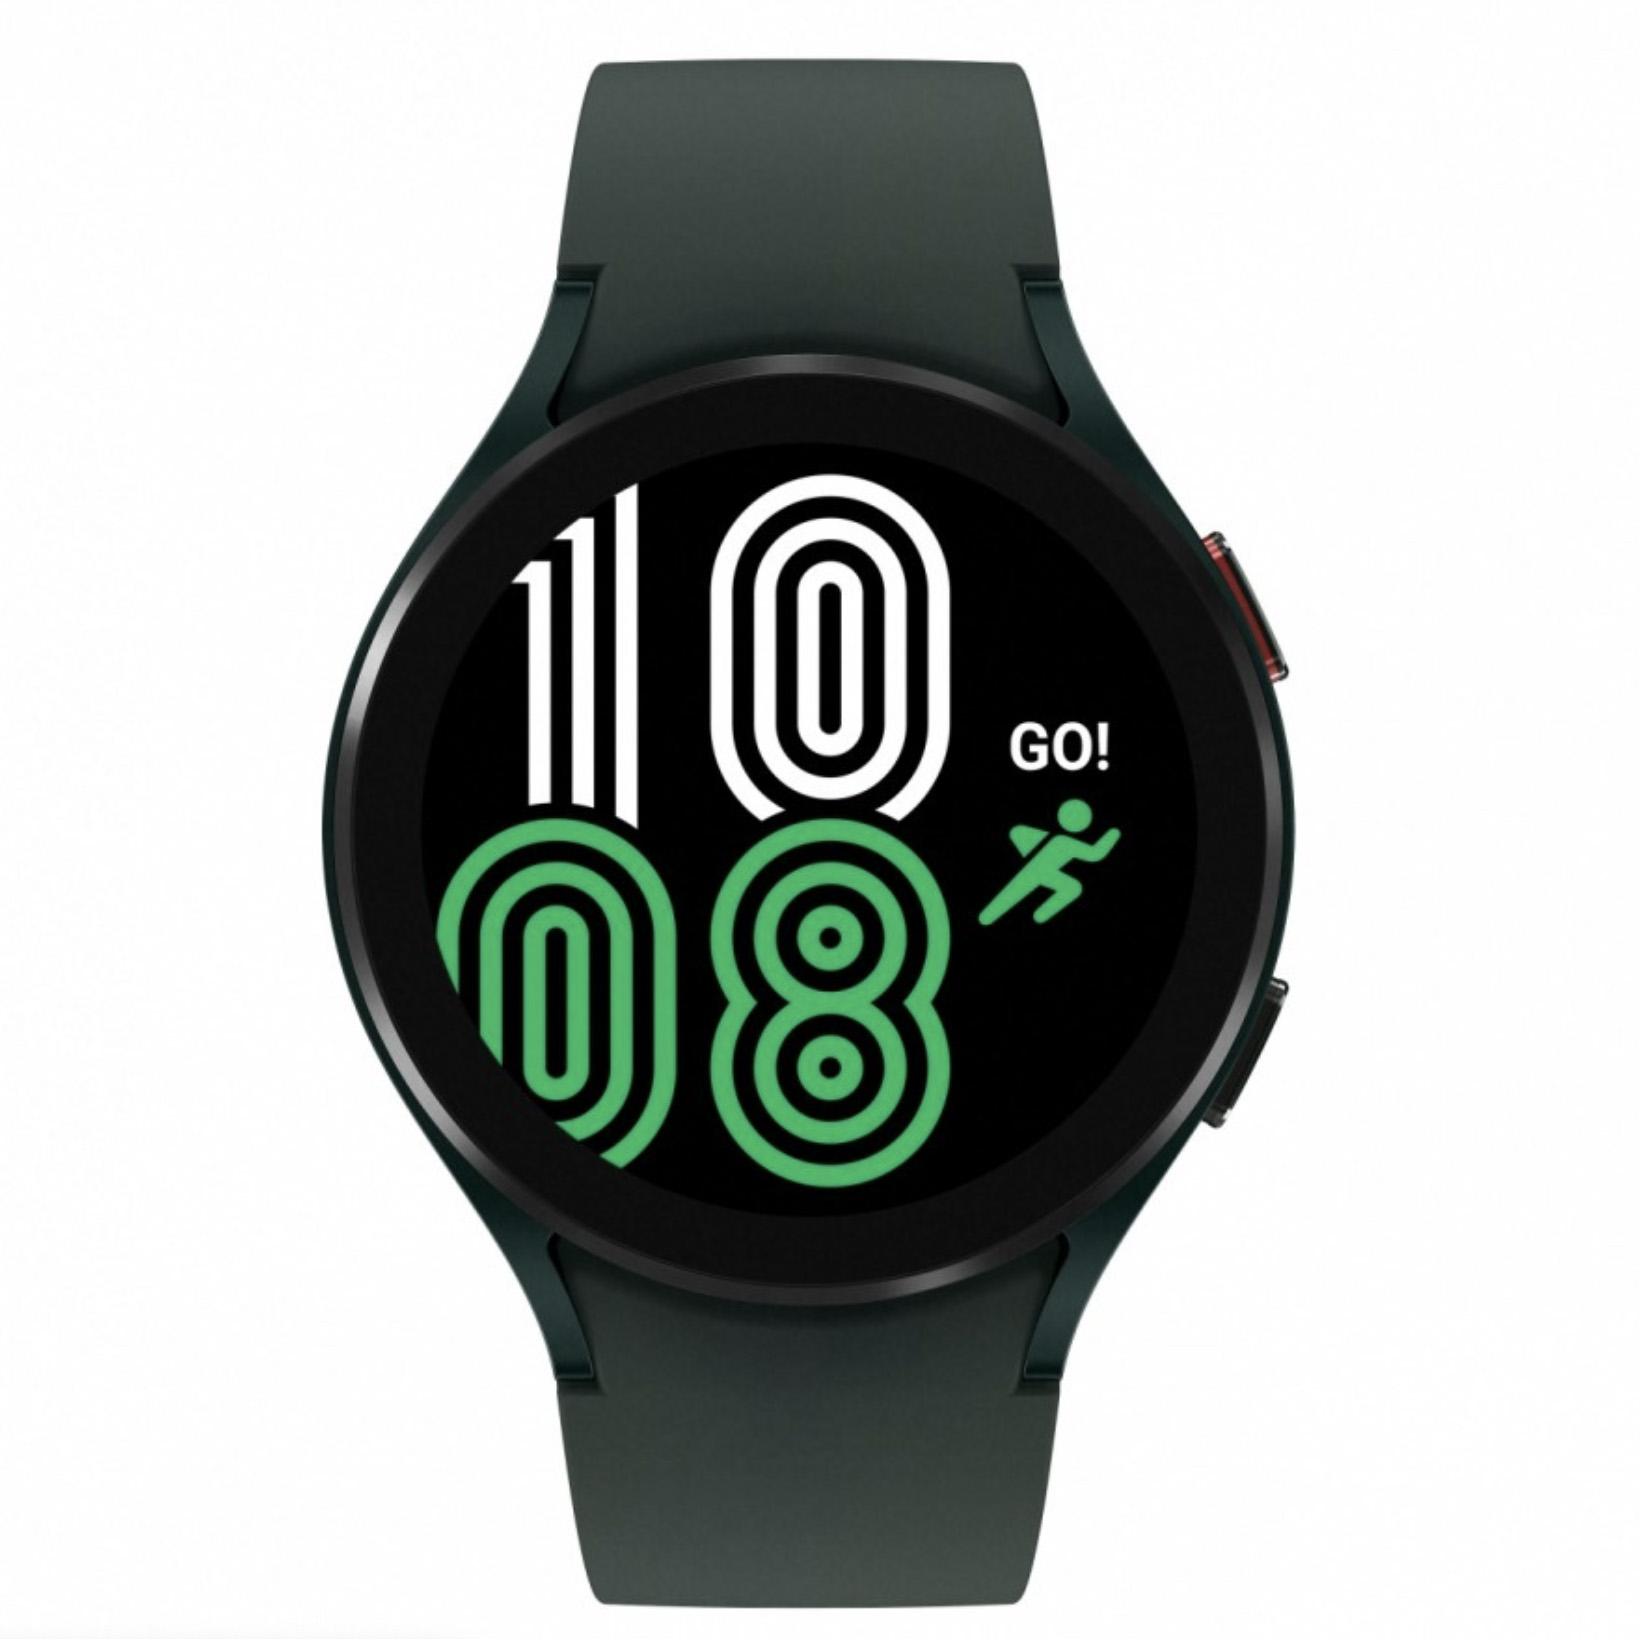 فروش نقدی و اقساطی ساعت هوشمند سامسونگ مدل Galaxy Watch4 44mm